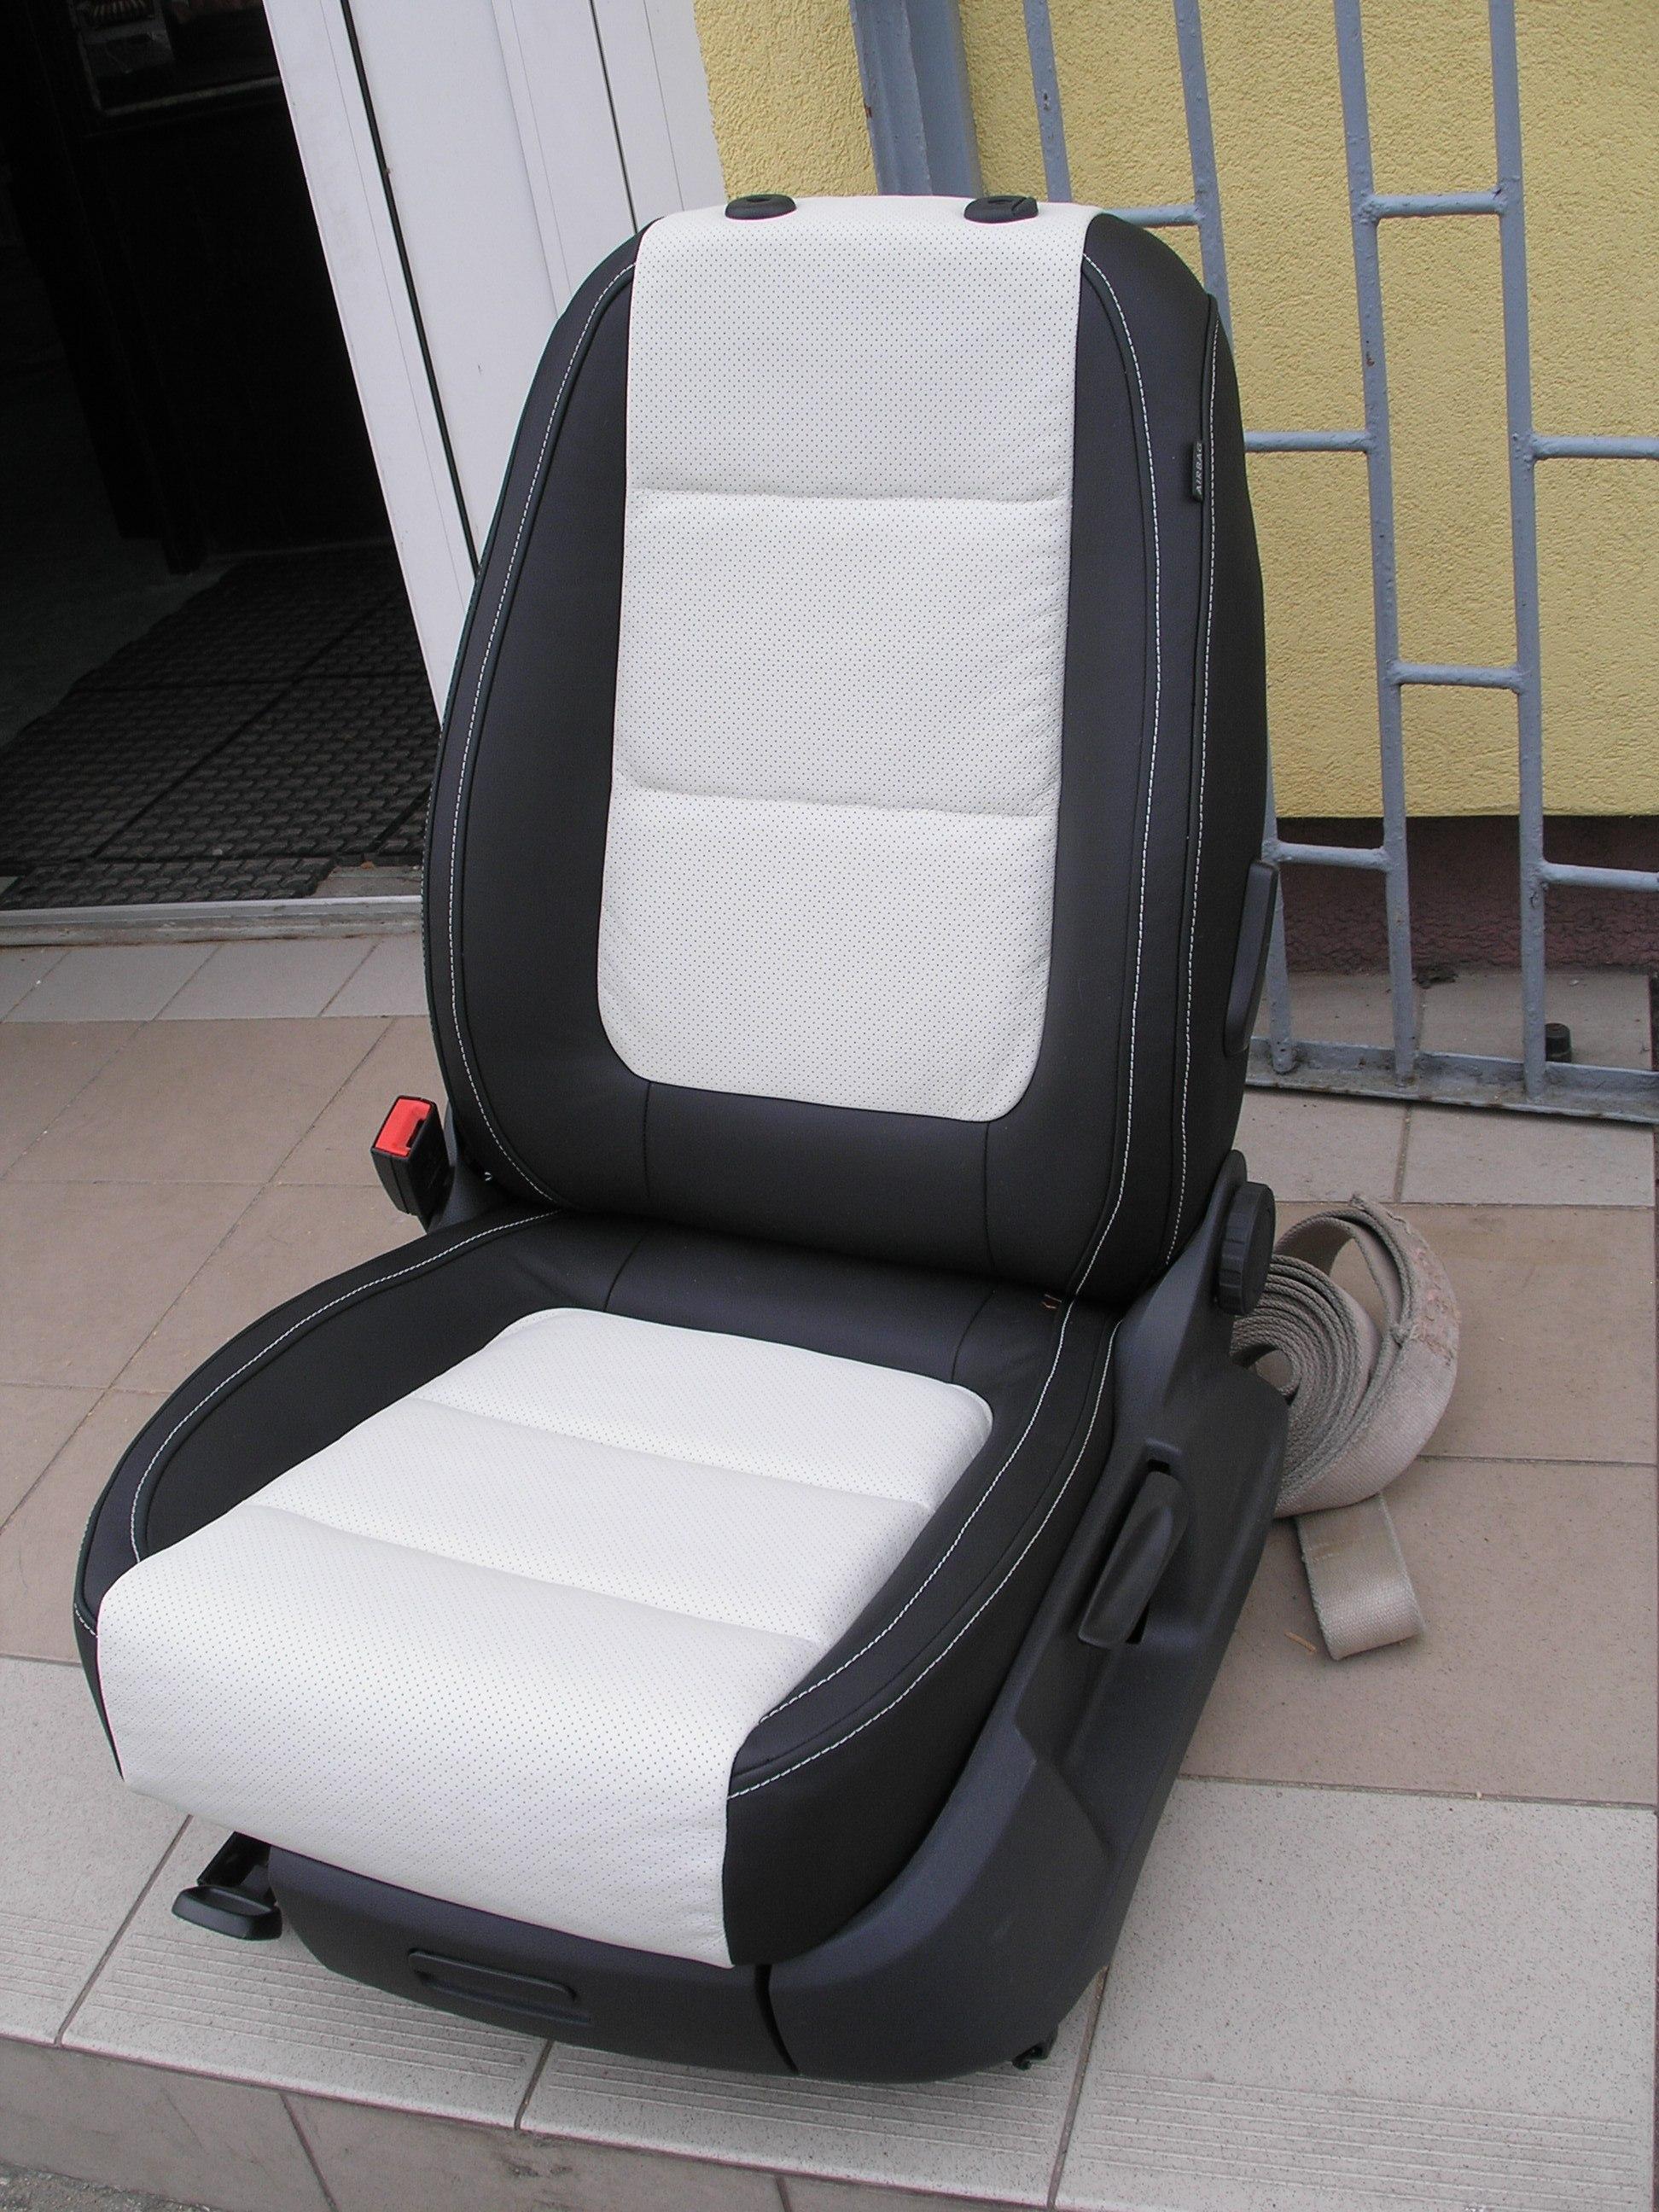 P3230845.JPG